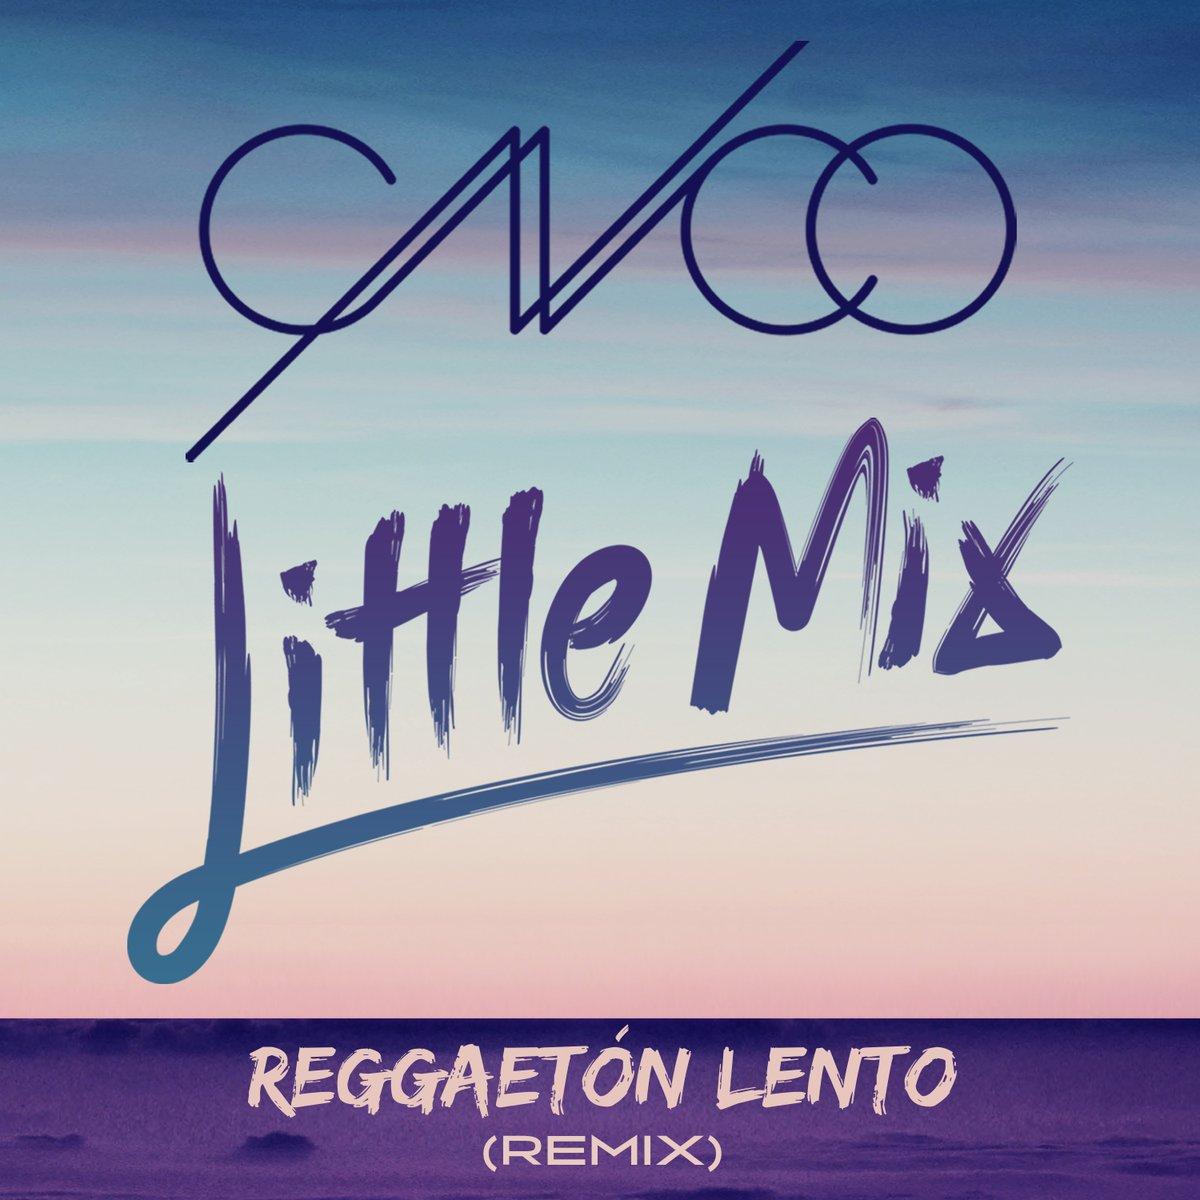 Cnco Little Mix Reggaetón Lento Remix Single Premiere Mjsbigblog